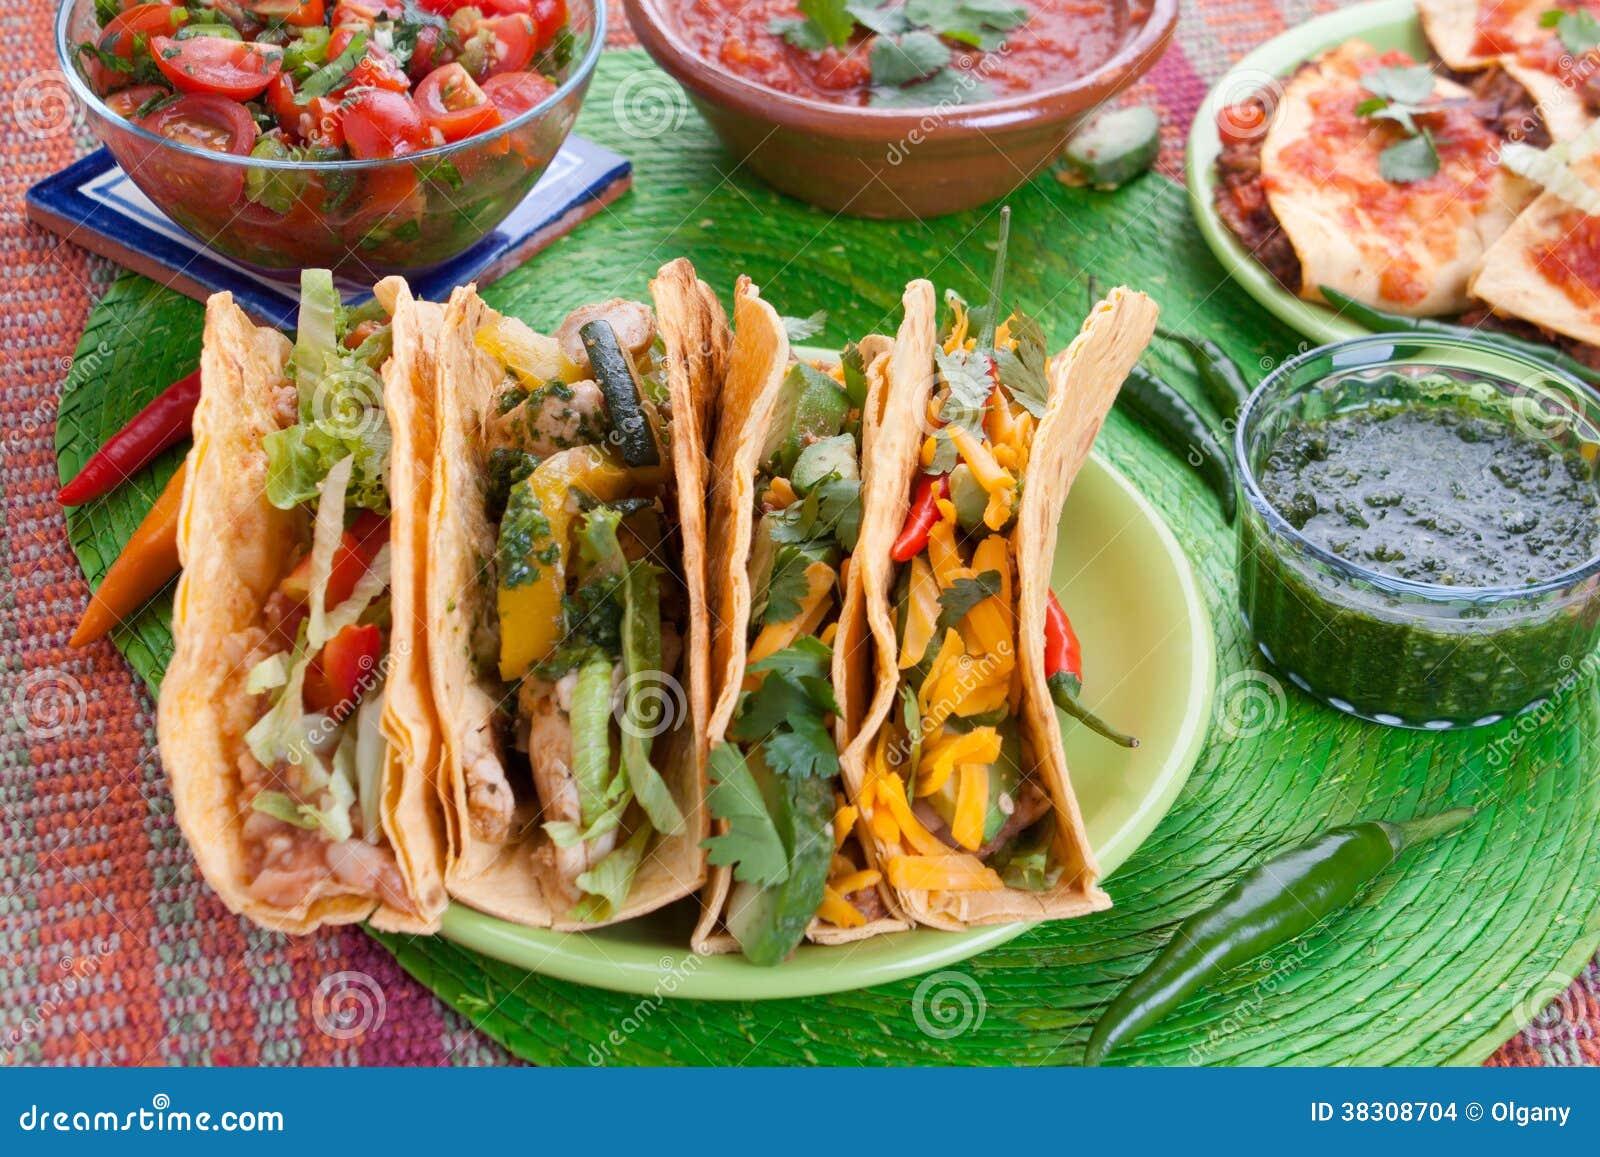 Comida mexicana tradicional imagenes de archivo imagen - Fotos de comodas ...